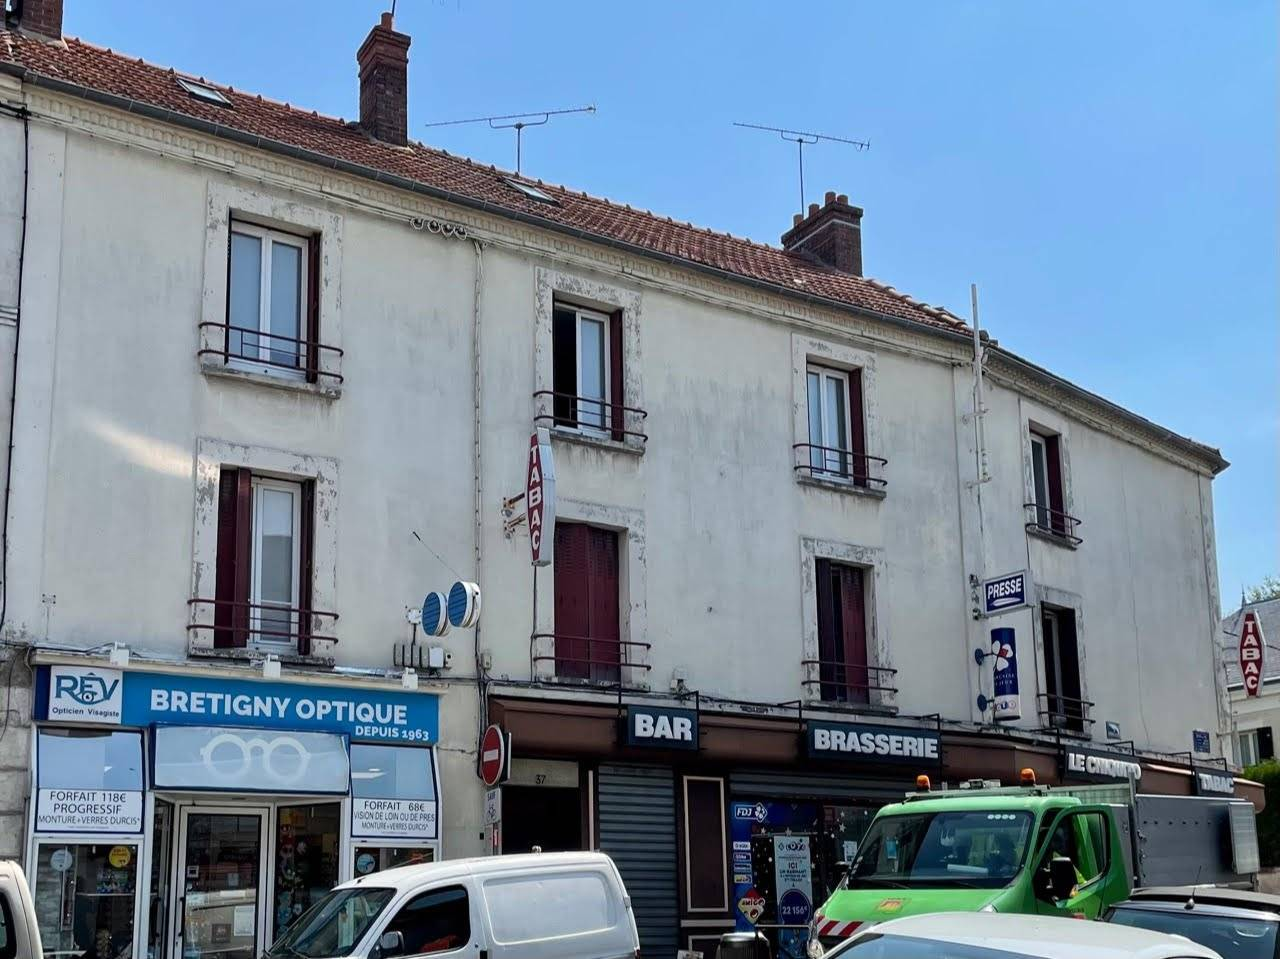 1 24 Brétigny-sur-Orge